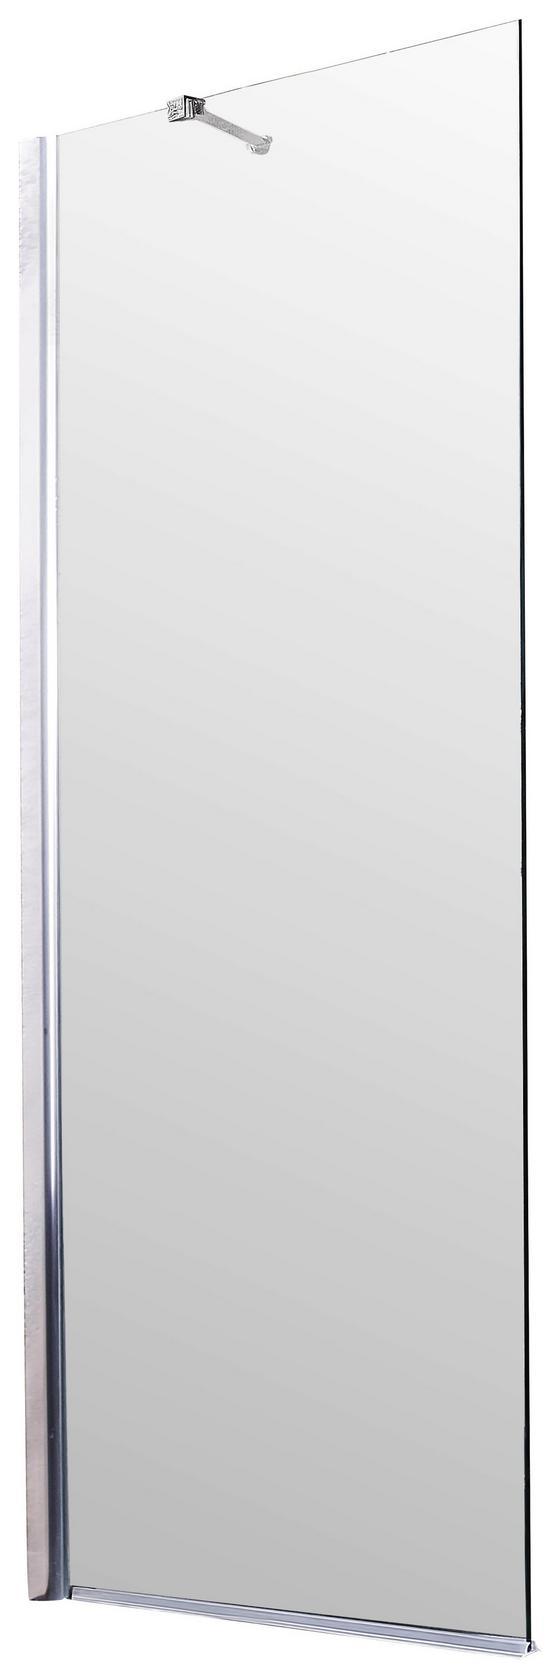 Duschtrennwand Sanoflex Young 75cm - MODERN, Glas (75-77/195cm)